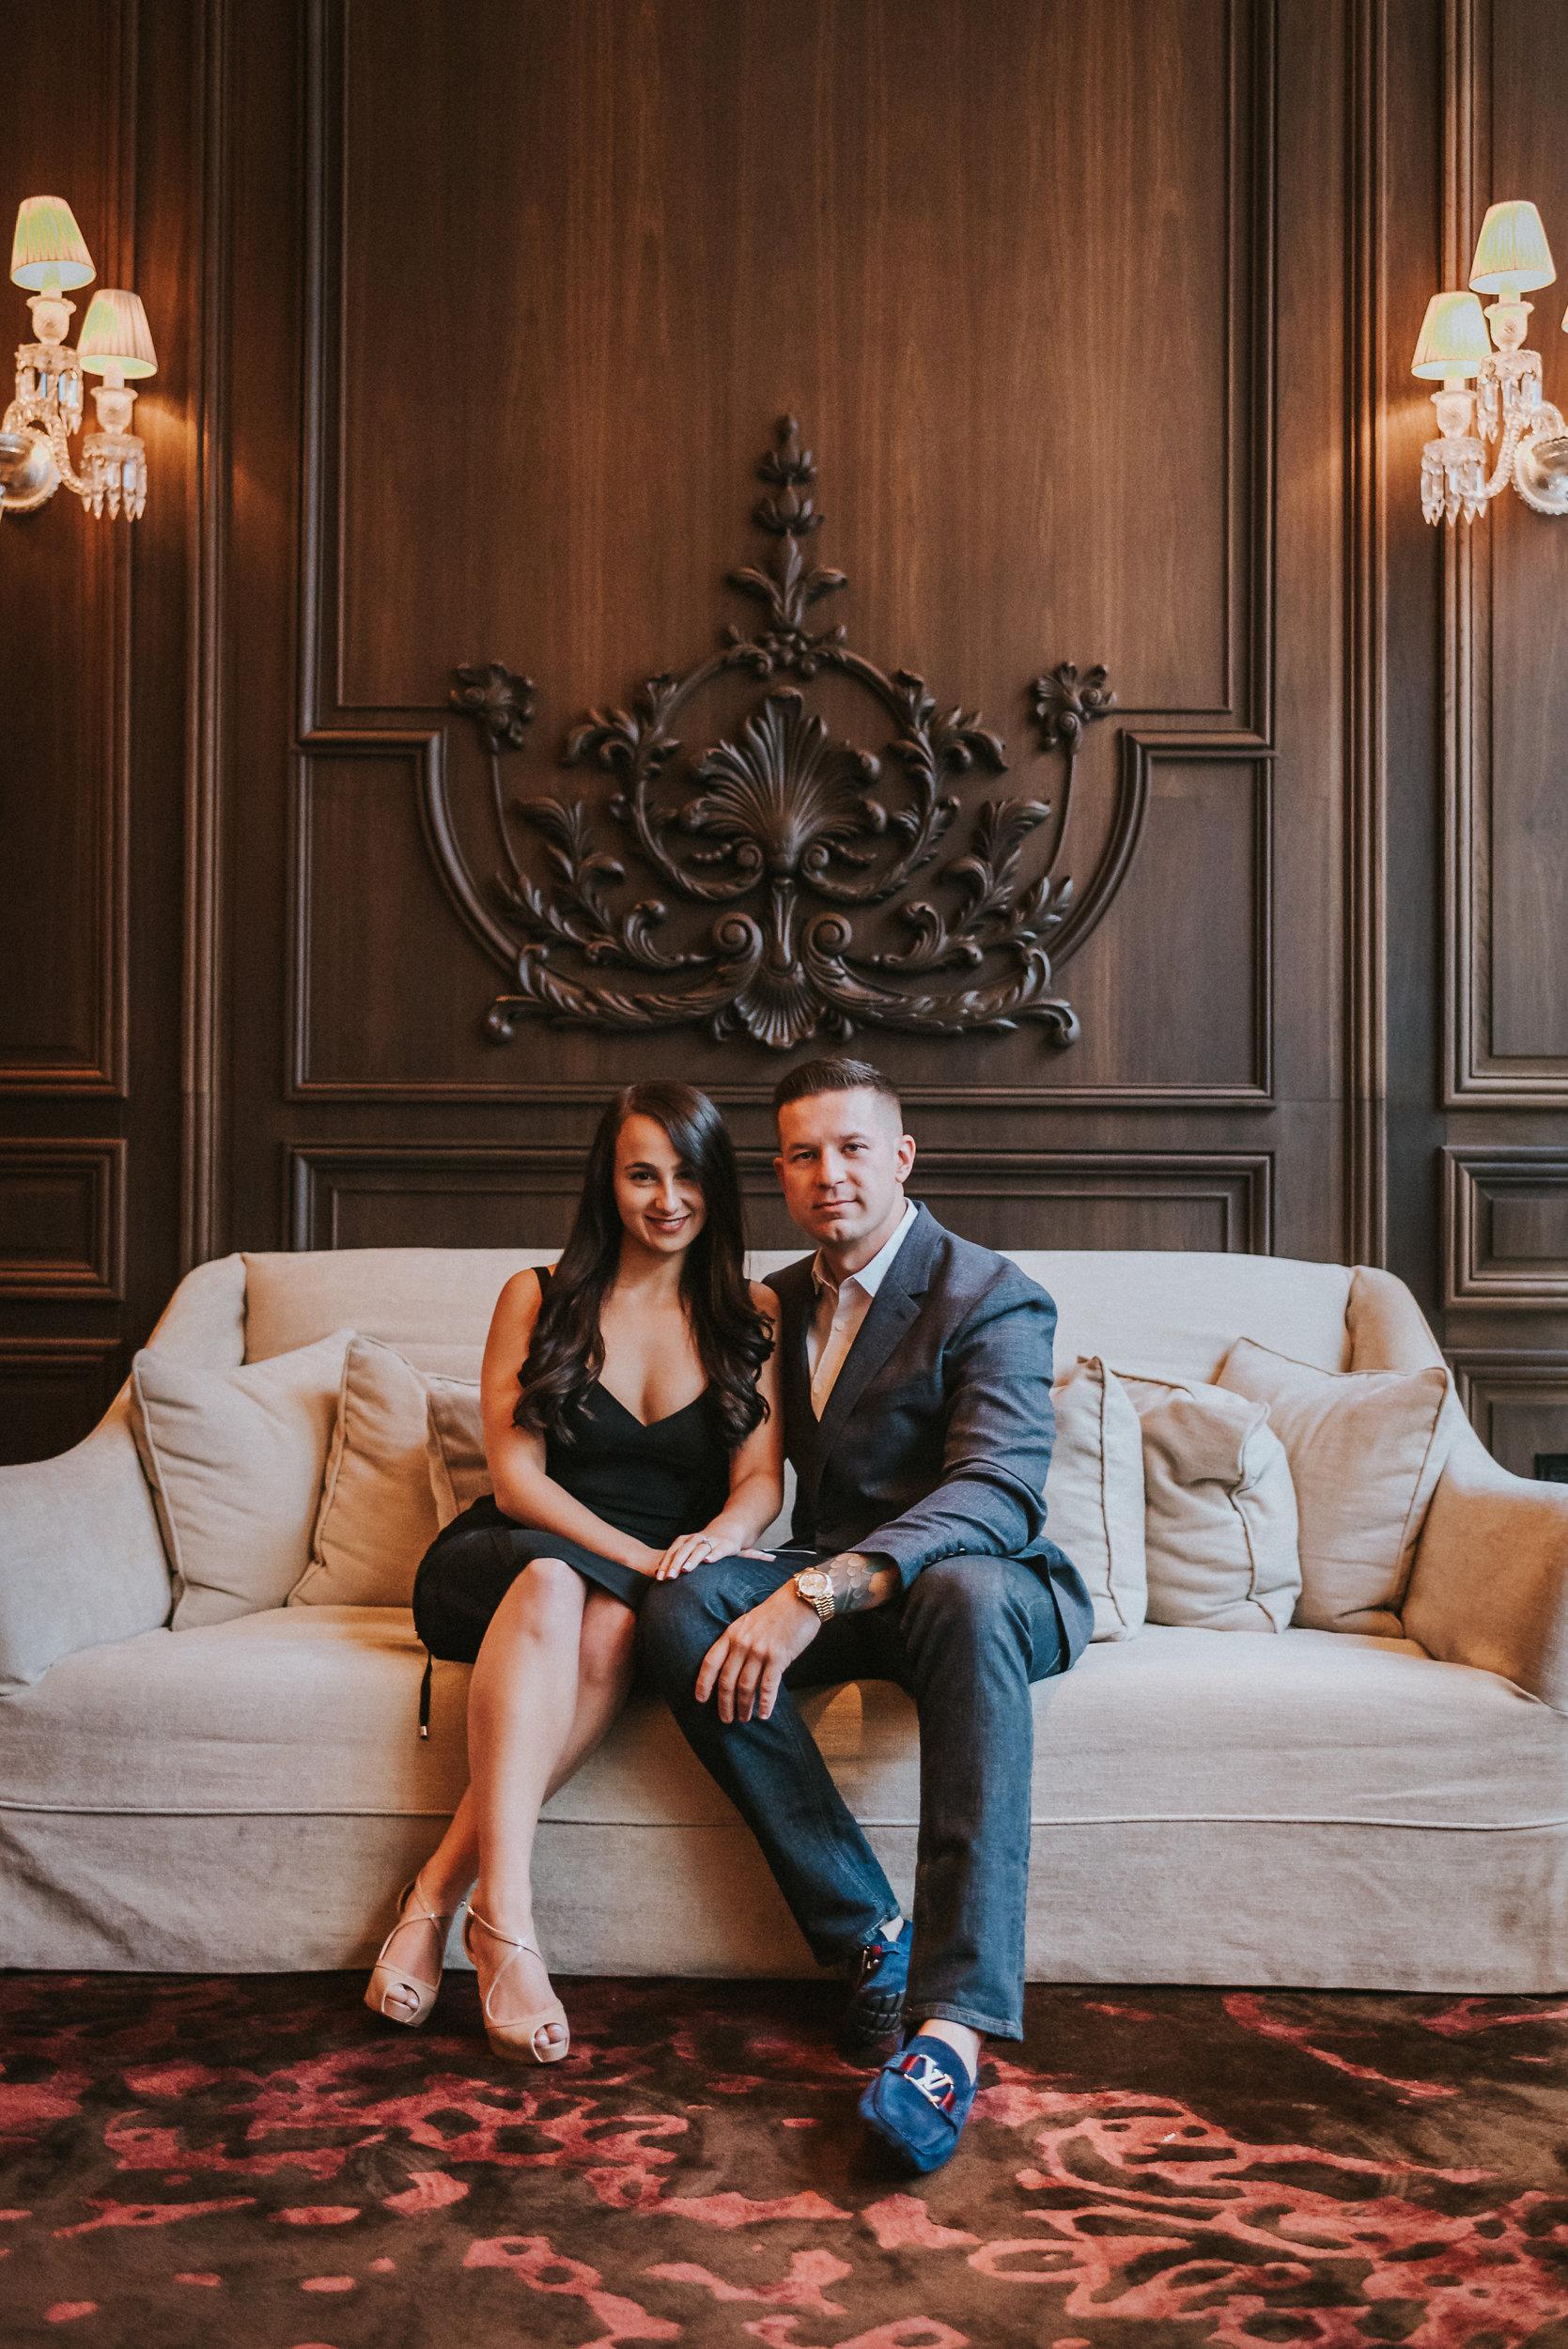 JOHN & SAMANTHA BACCARAT HOTEL PROPOSAL NYC NEW YORK (9).jpg